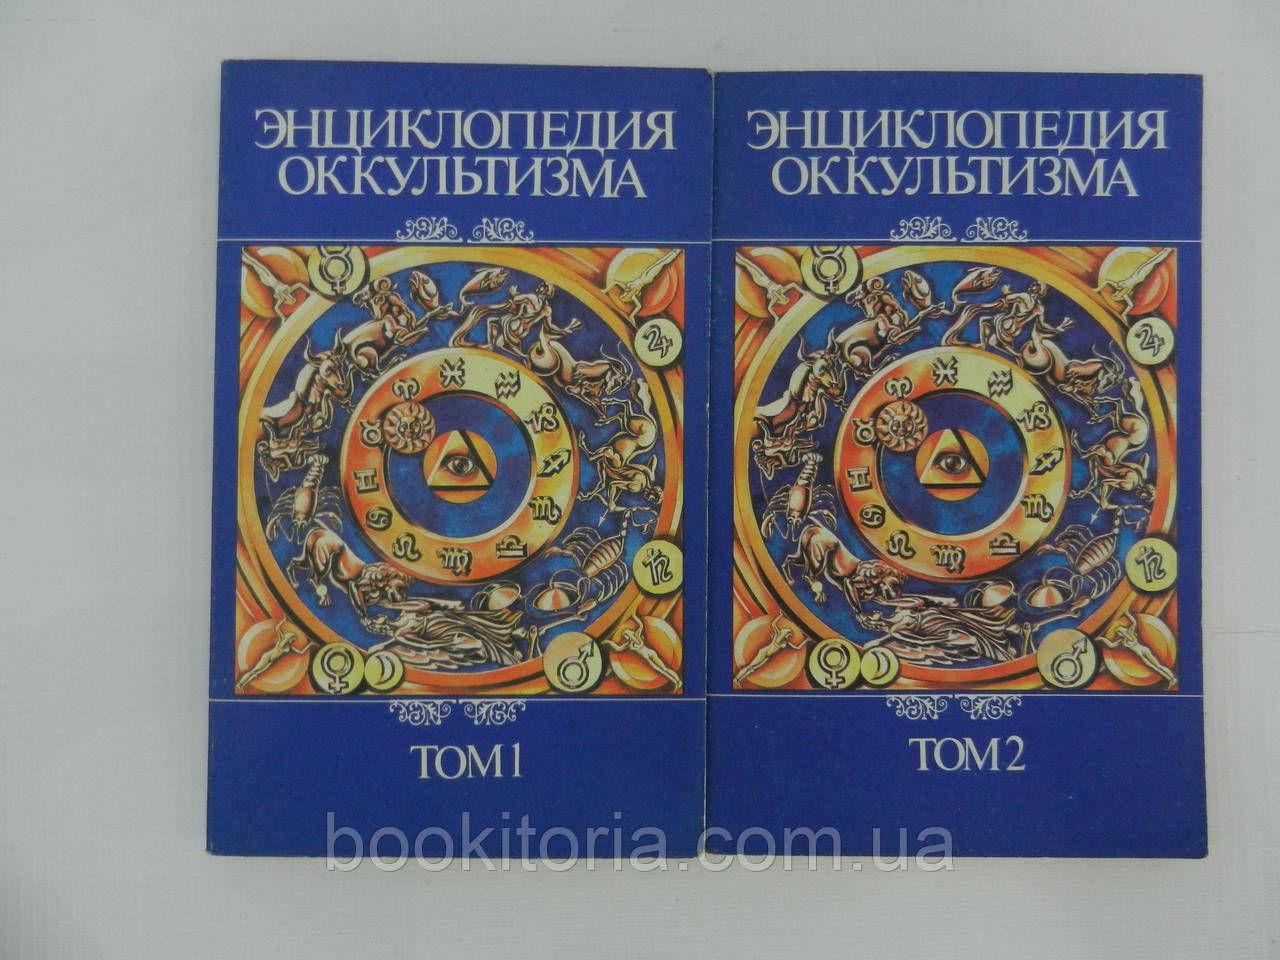 Энциклопедия оккультизма. В 2 (двух) томах (б/у).